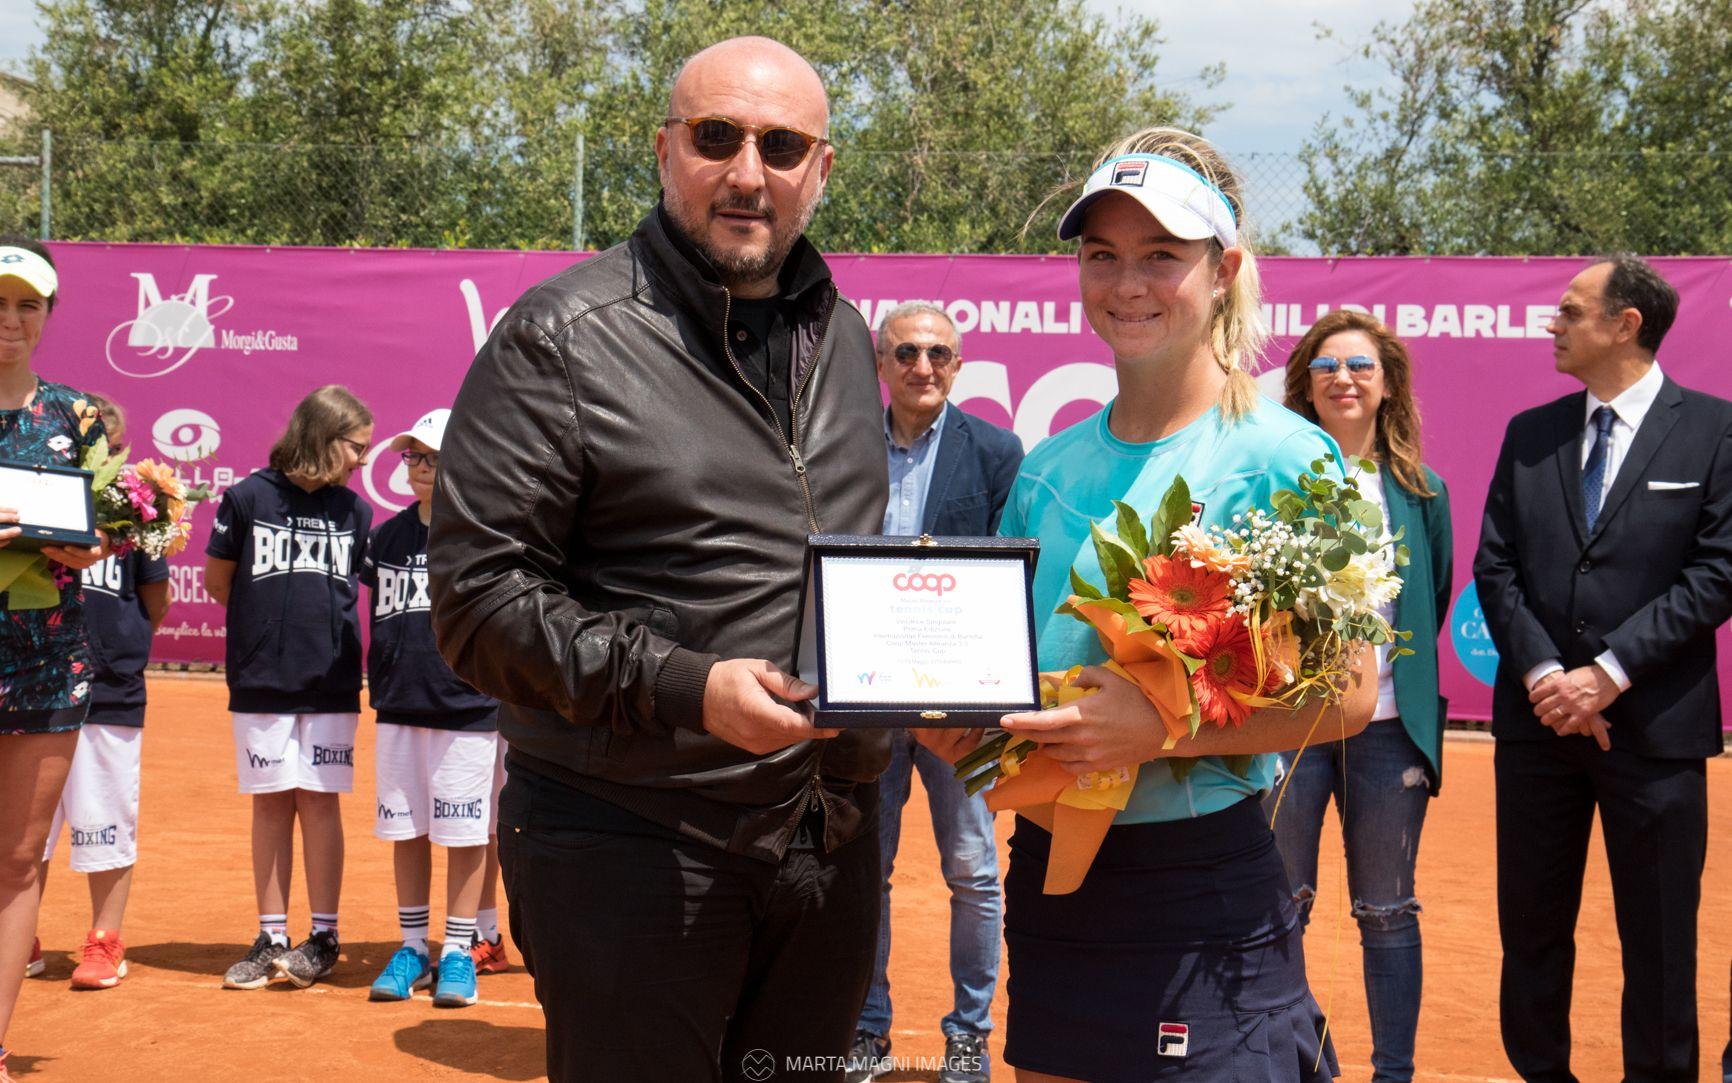 Elizabeth Mandlik vincitrice del torneo di Barletta - Foto Marta Magni